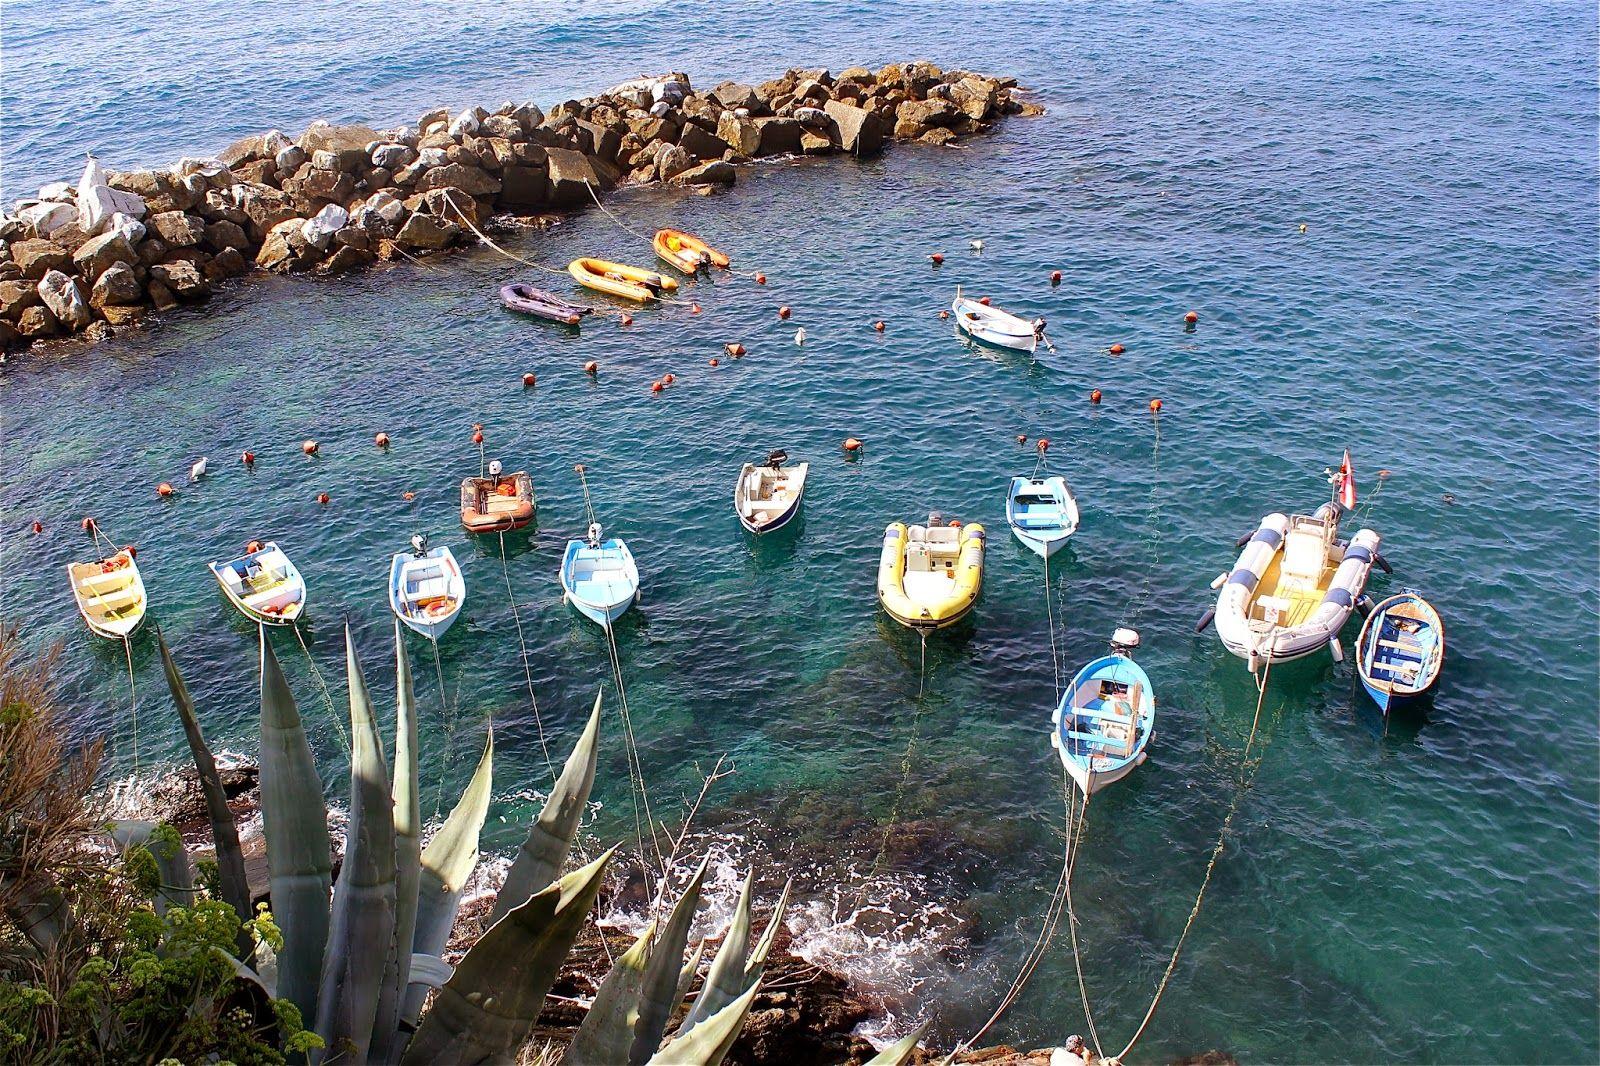 World, Surprise me: Cinque Terre, Italy